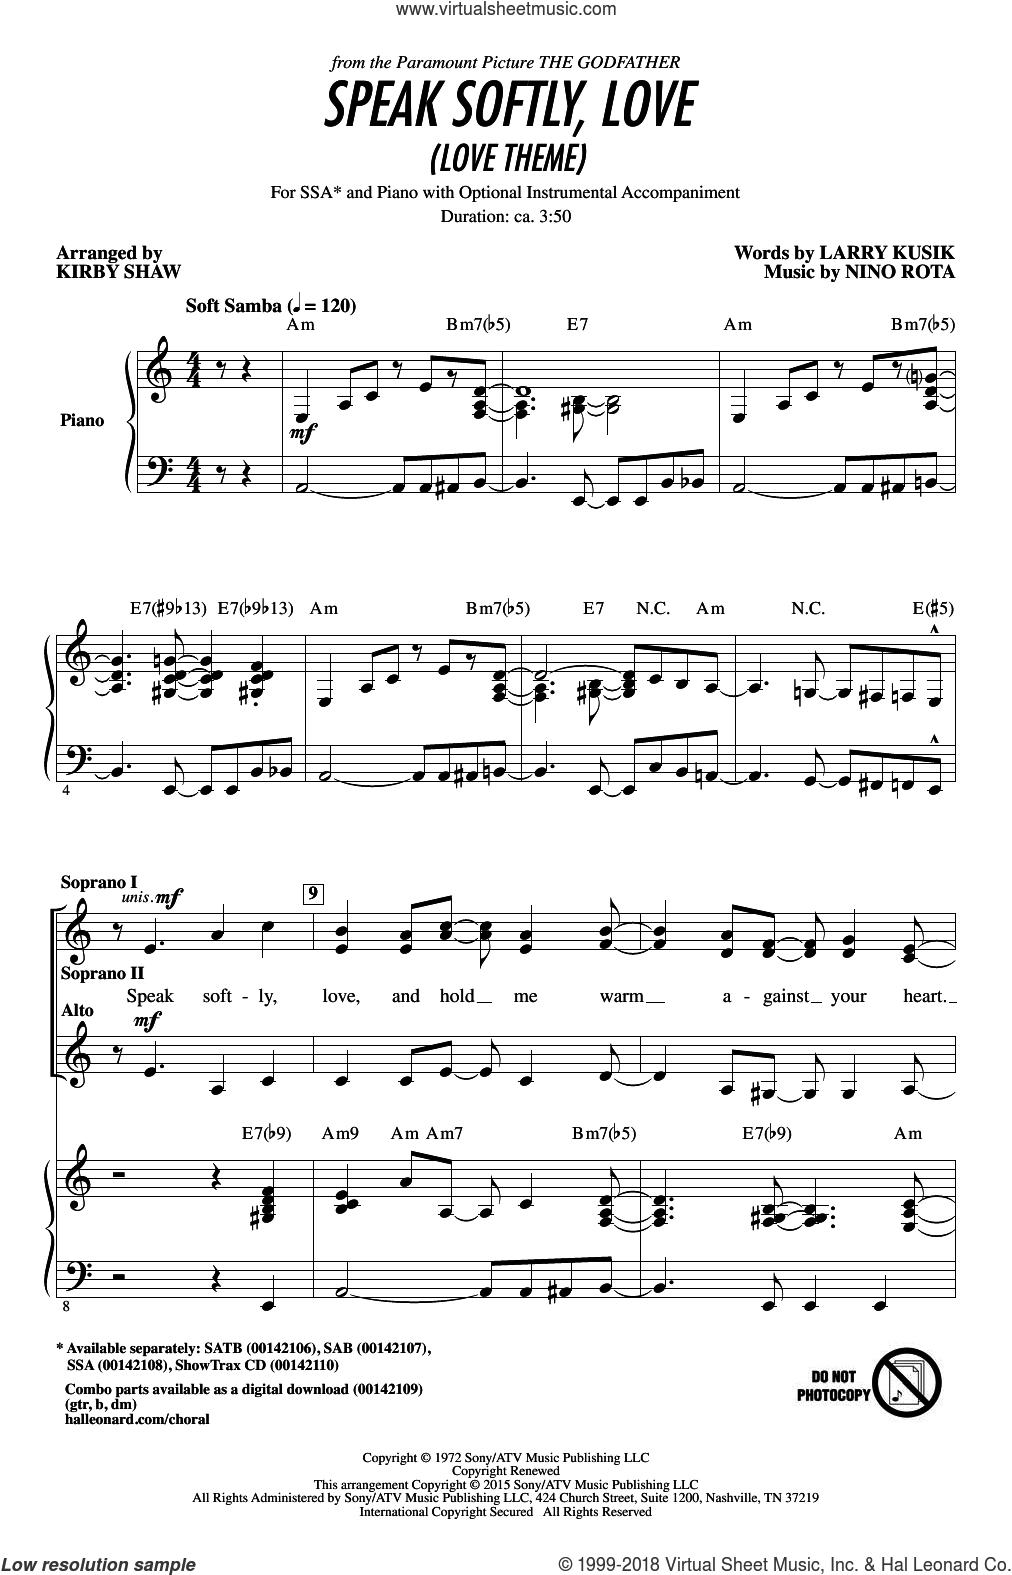 Speak Softly, Love (Love Theme) sheet music for choir (SSA: soprano, alto) by Kirby Shaw, Andy Williams, Larry Kusik and Nino Rota, intermediate skill level